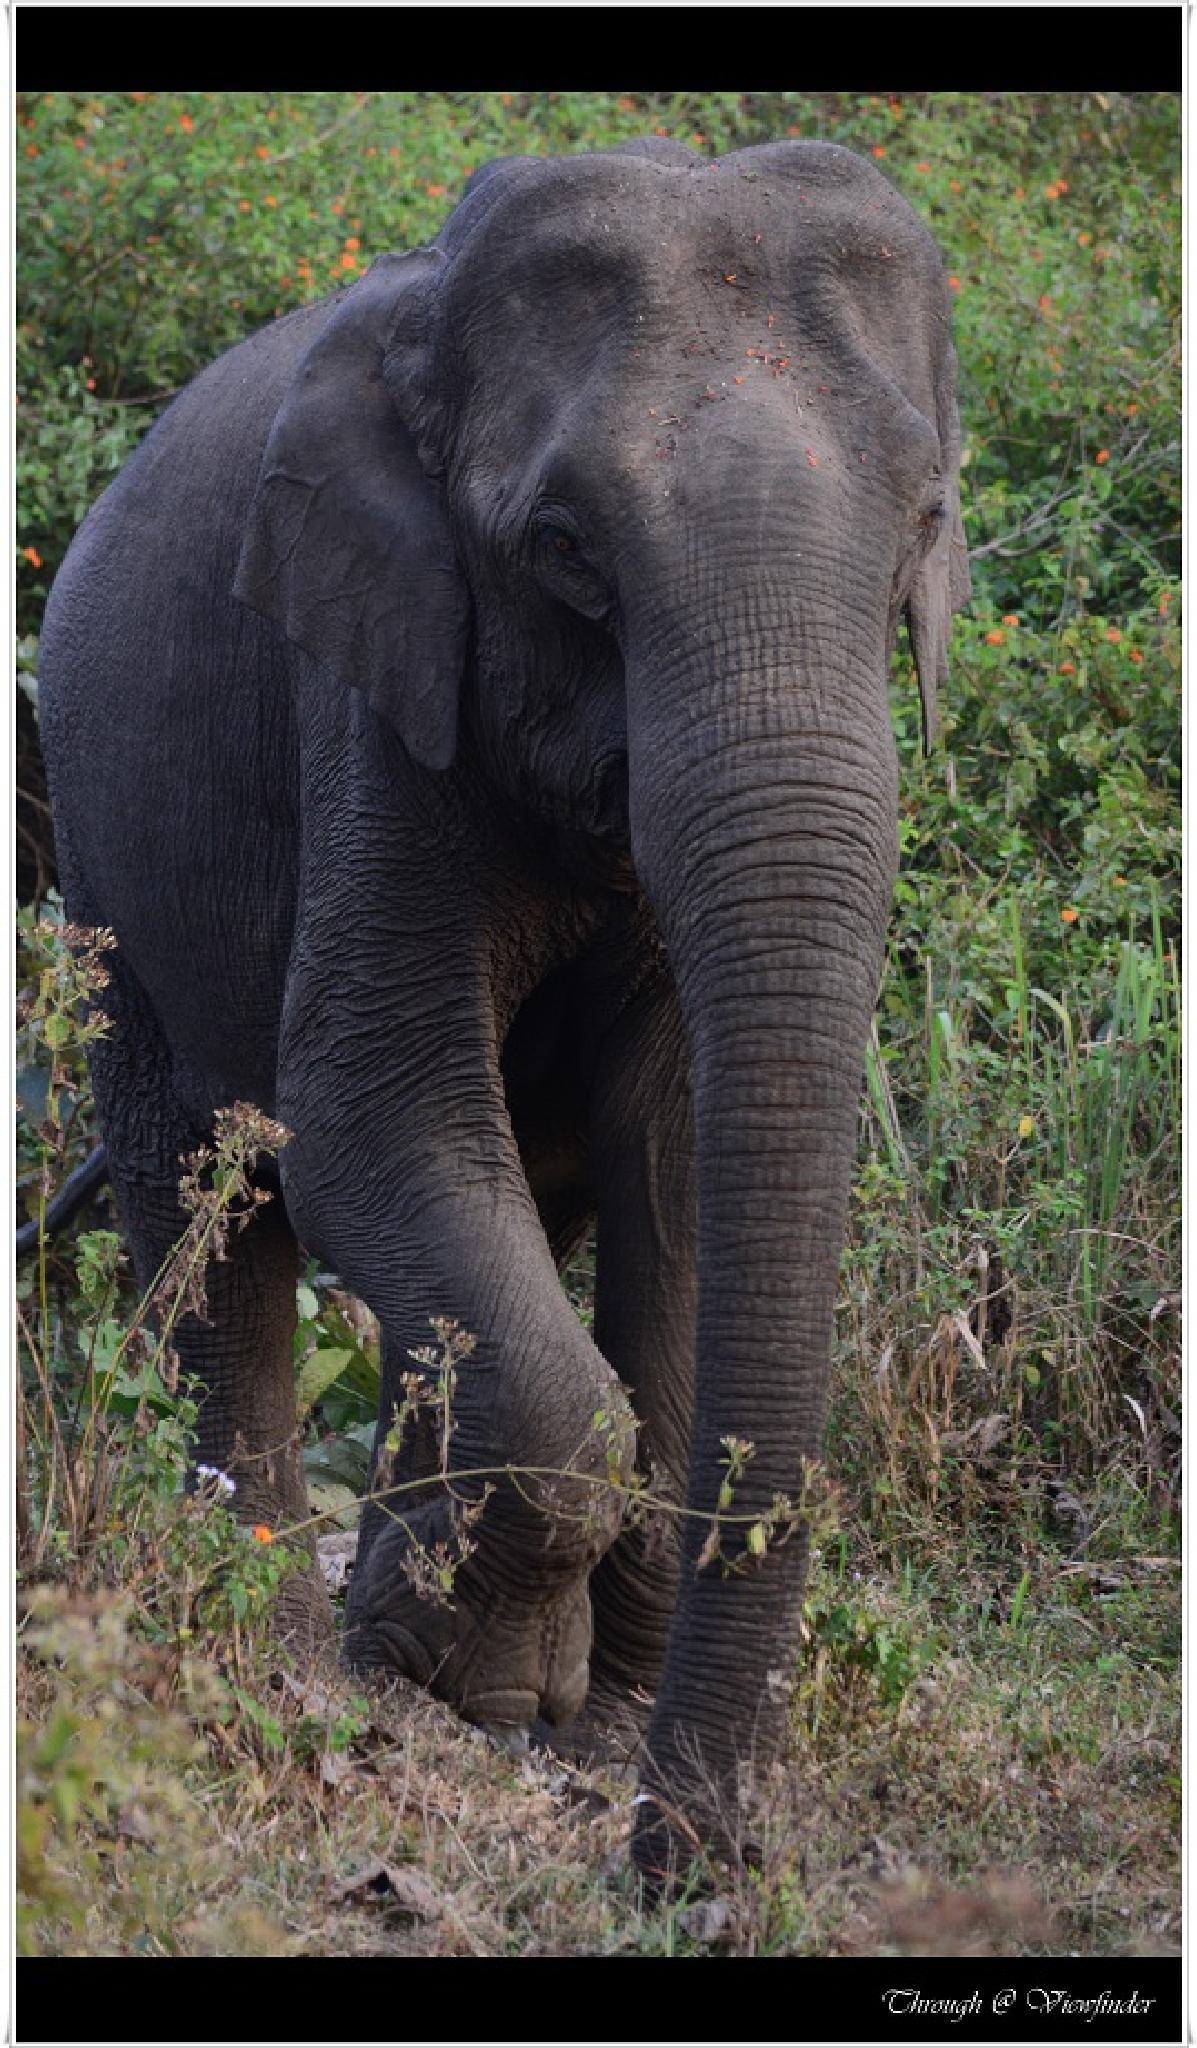 Wild Indian Elephant by prashobh.ailyam